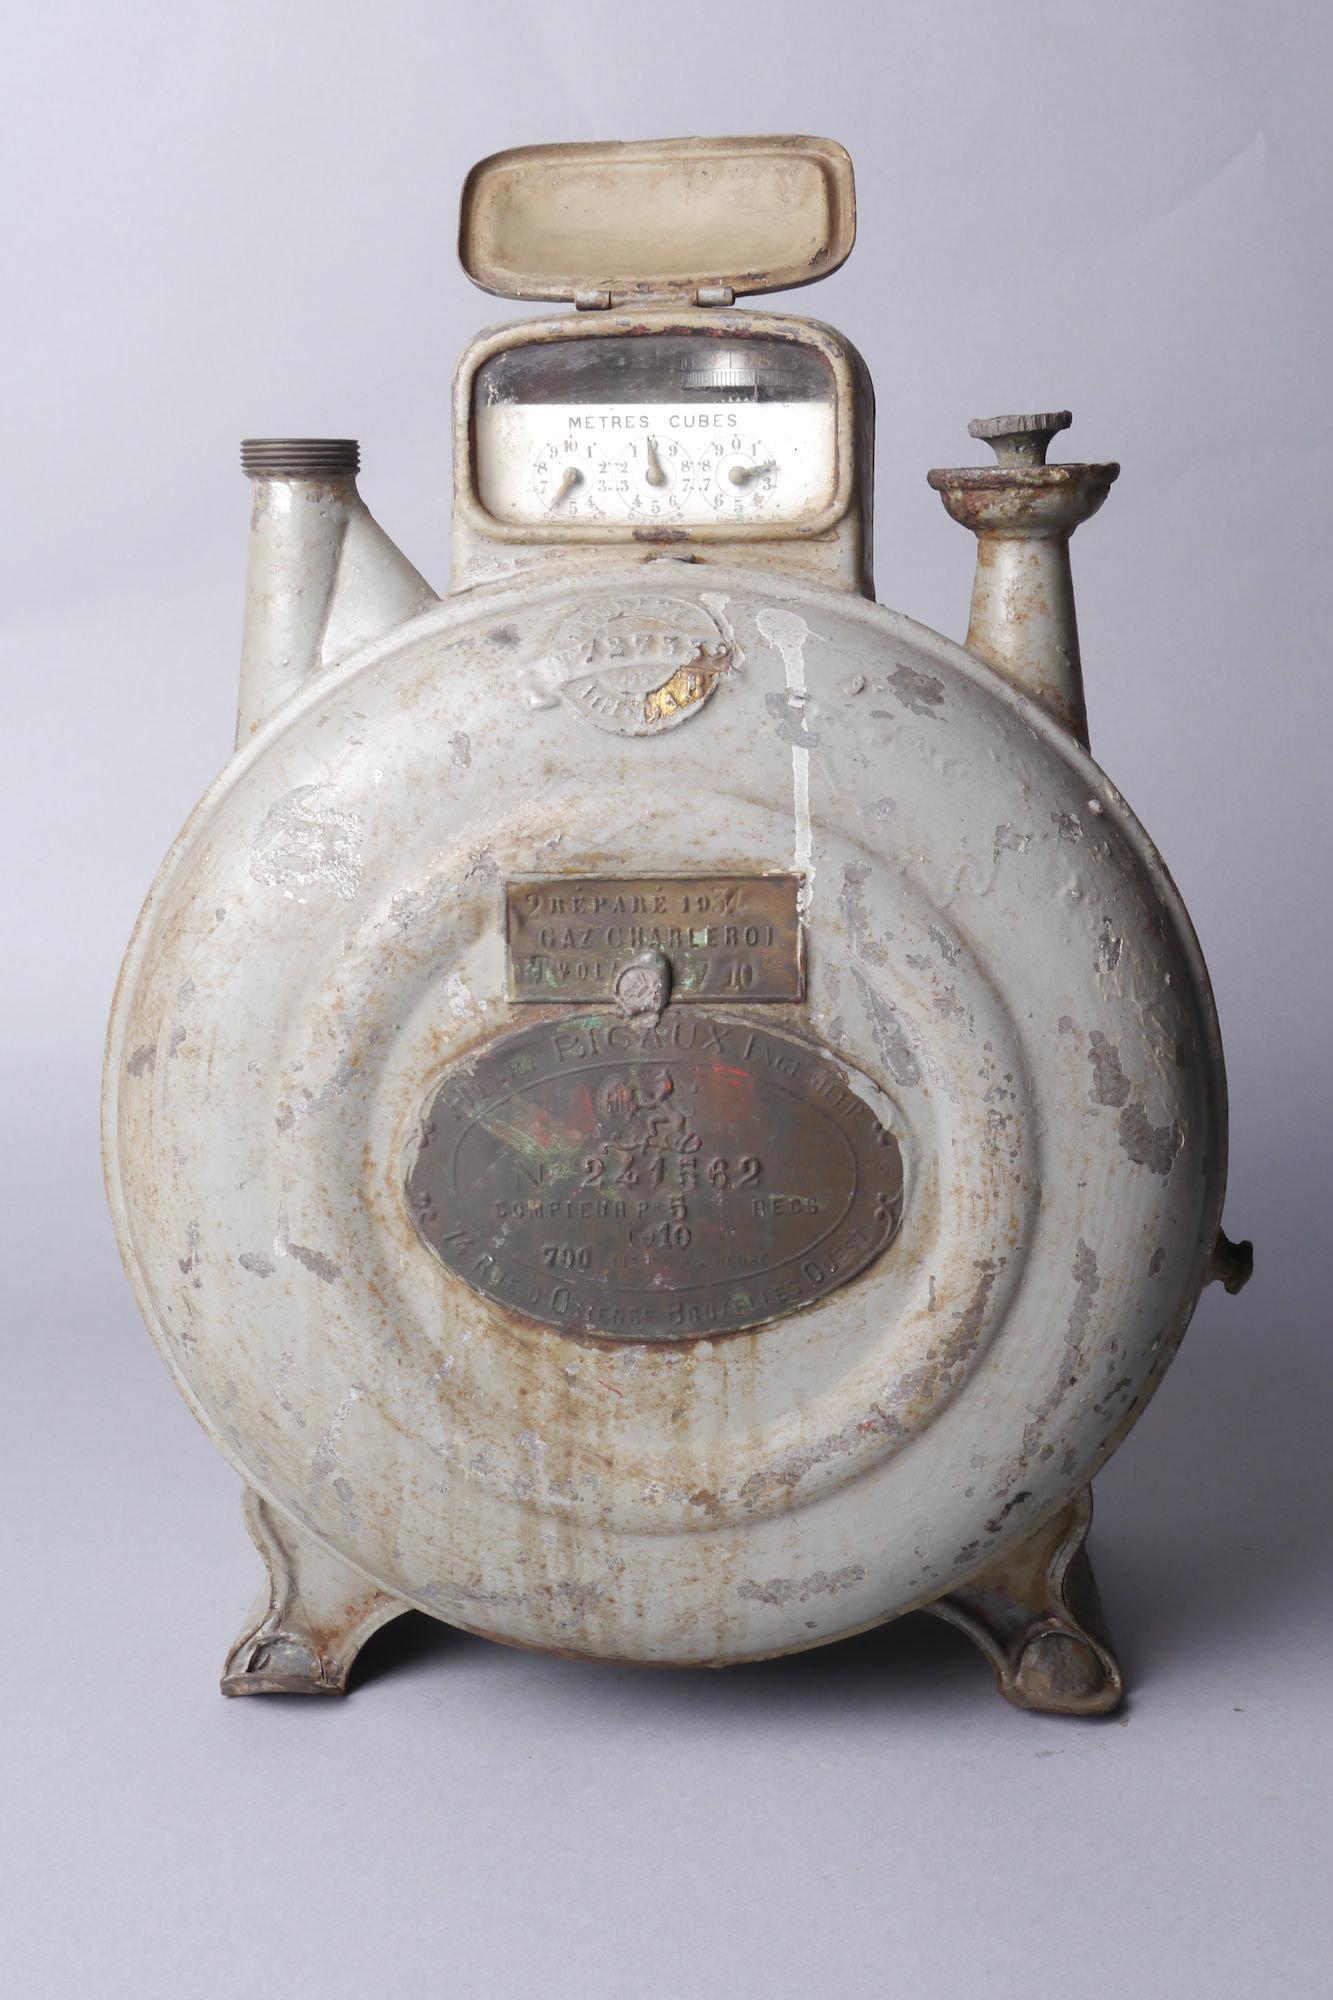 Verbruiksmeter voor gas van het merk Rigaux